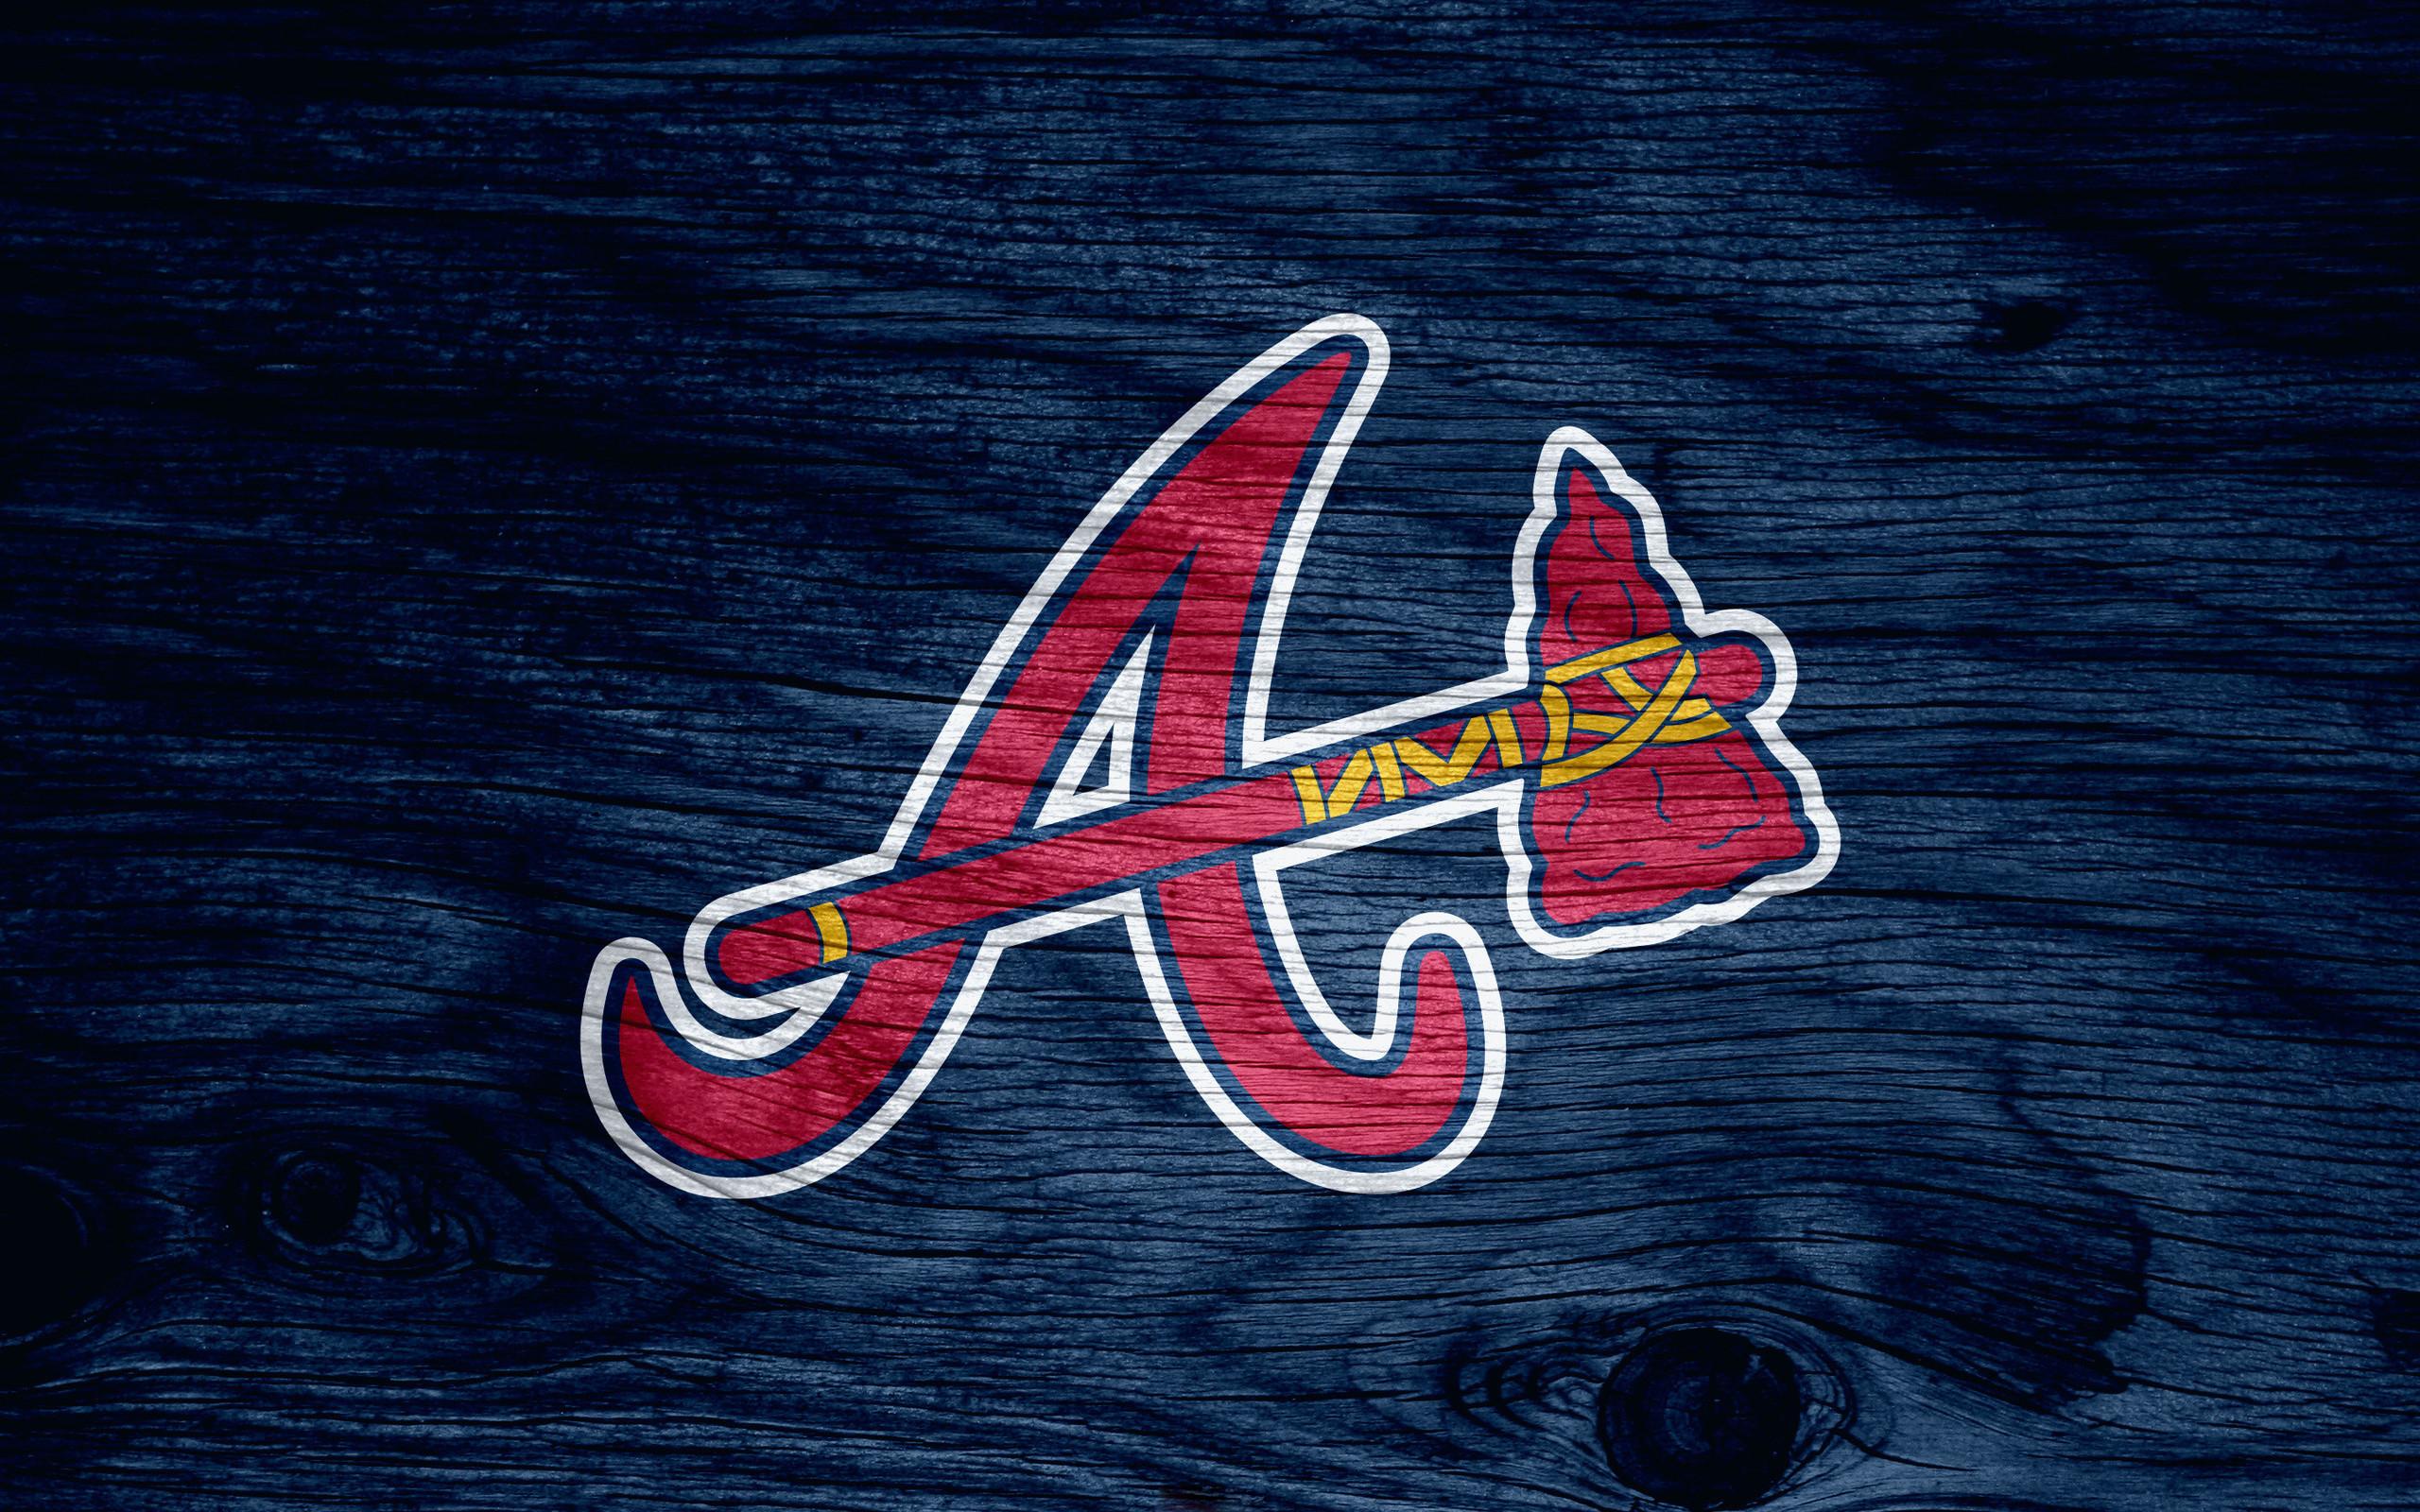 Atlanta Braves Wallpapers (62+ images)Atlanta Braves